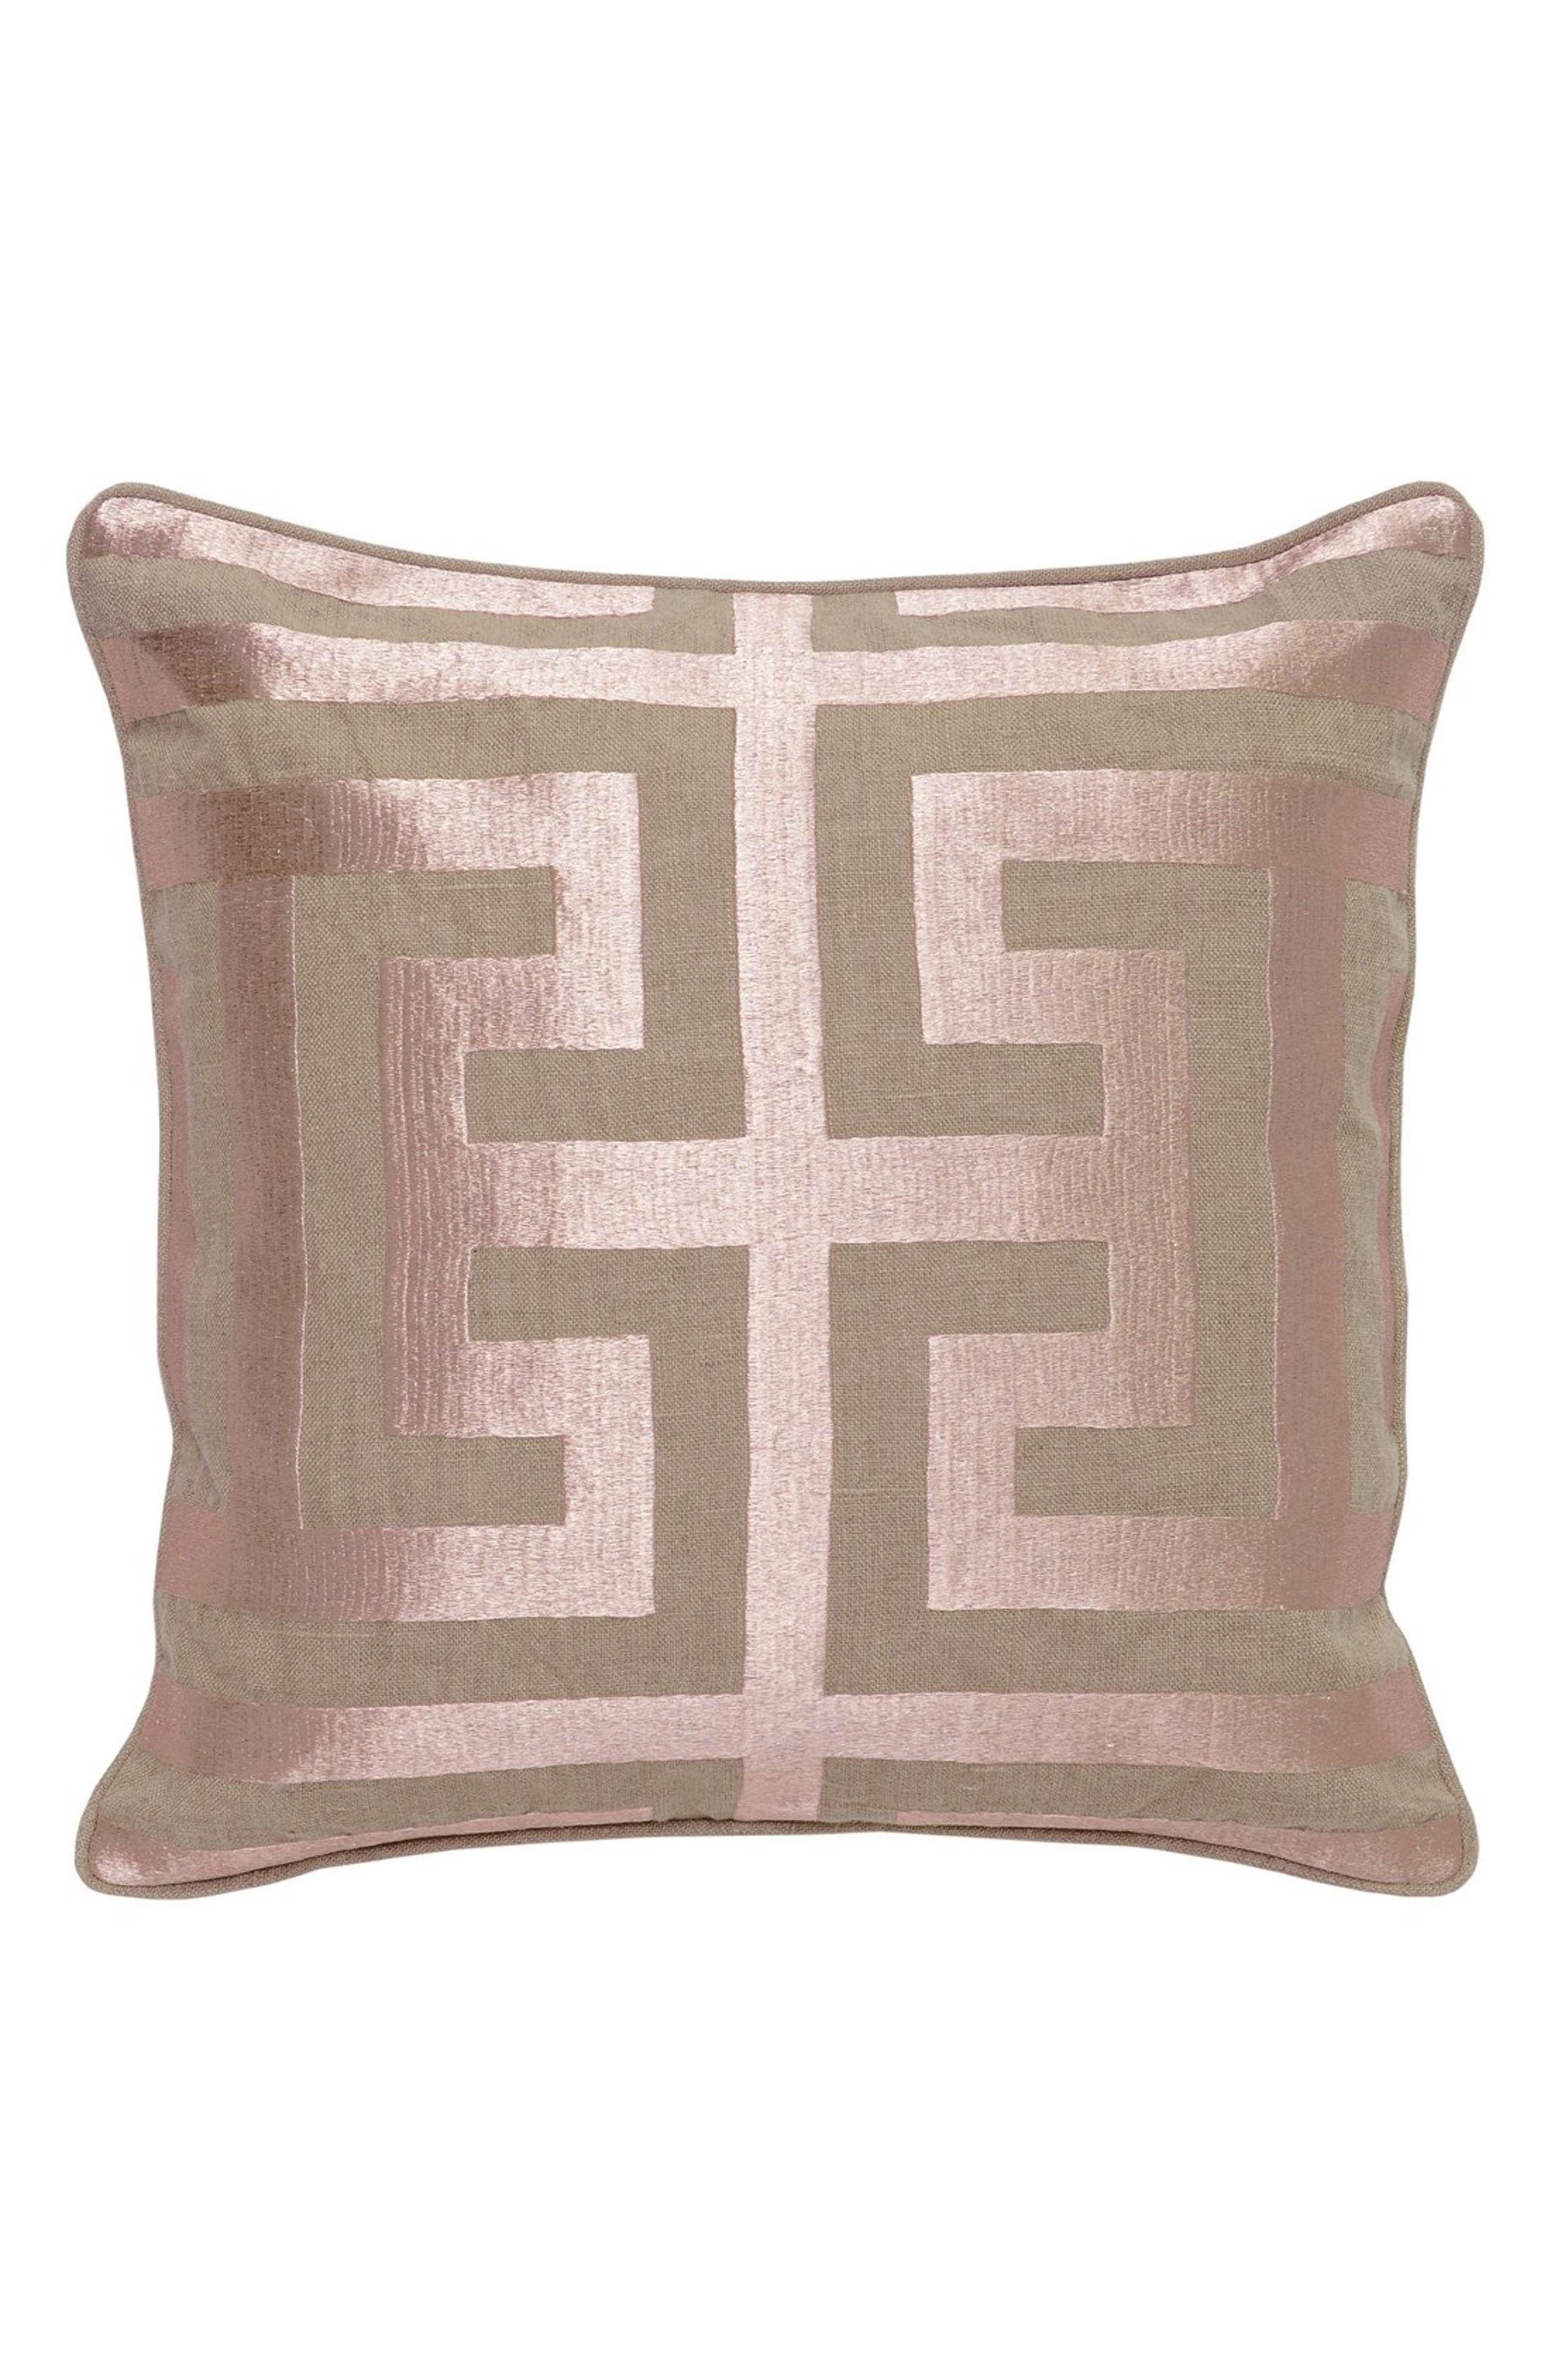 Villa home collection ucapitalu decorative pillow rose gold